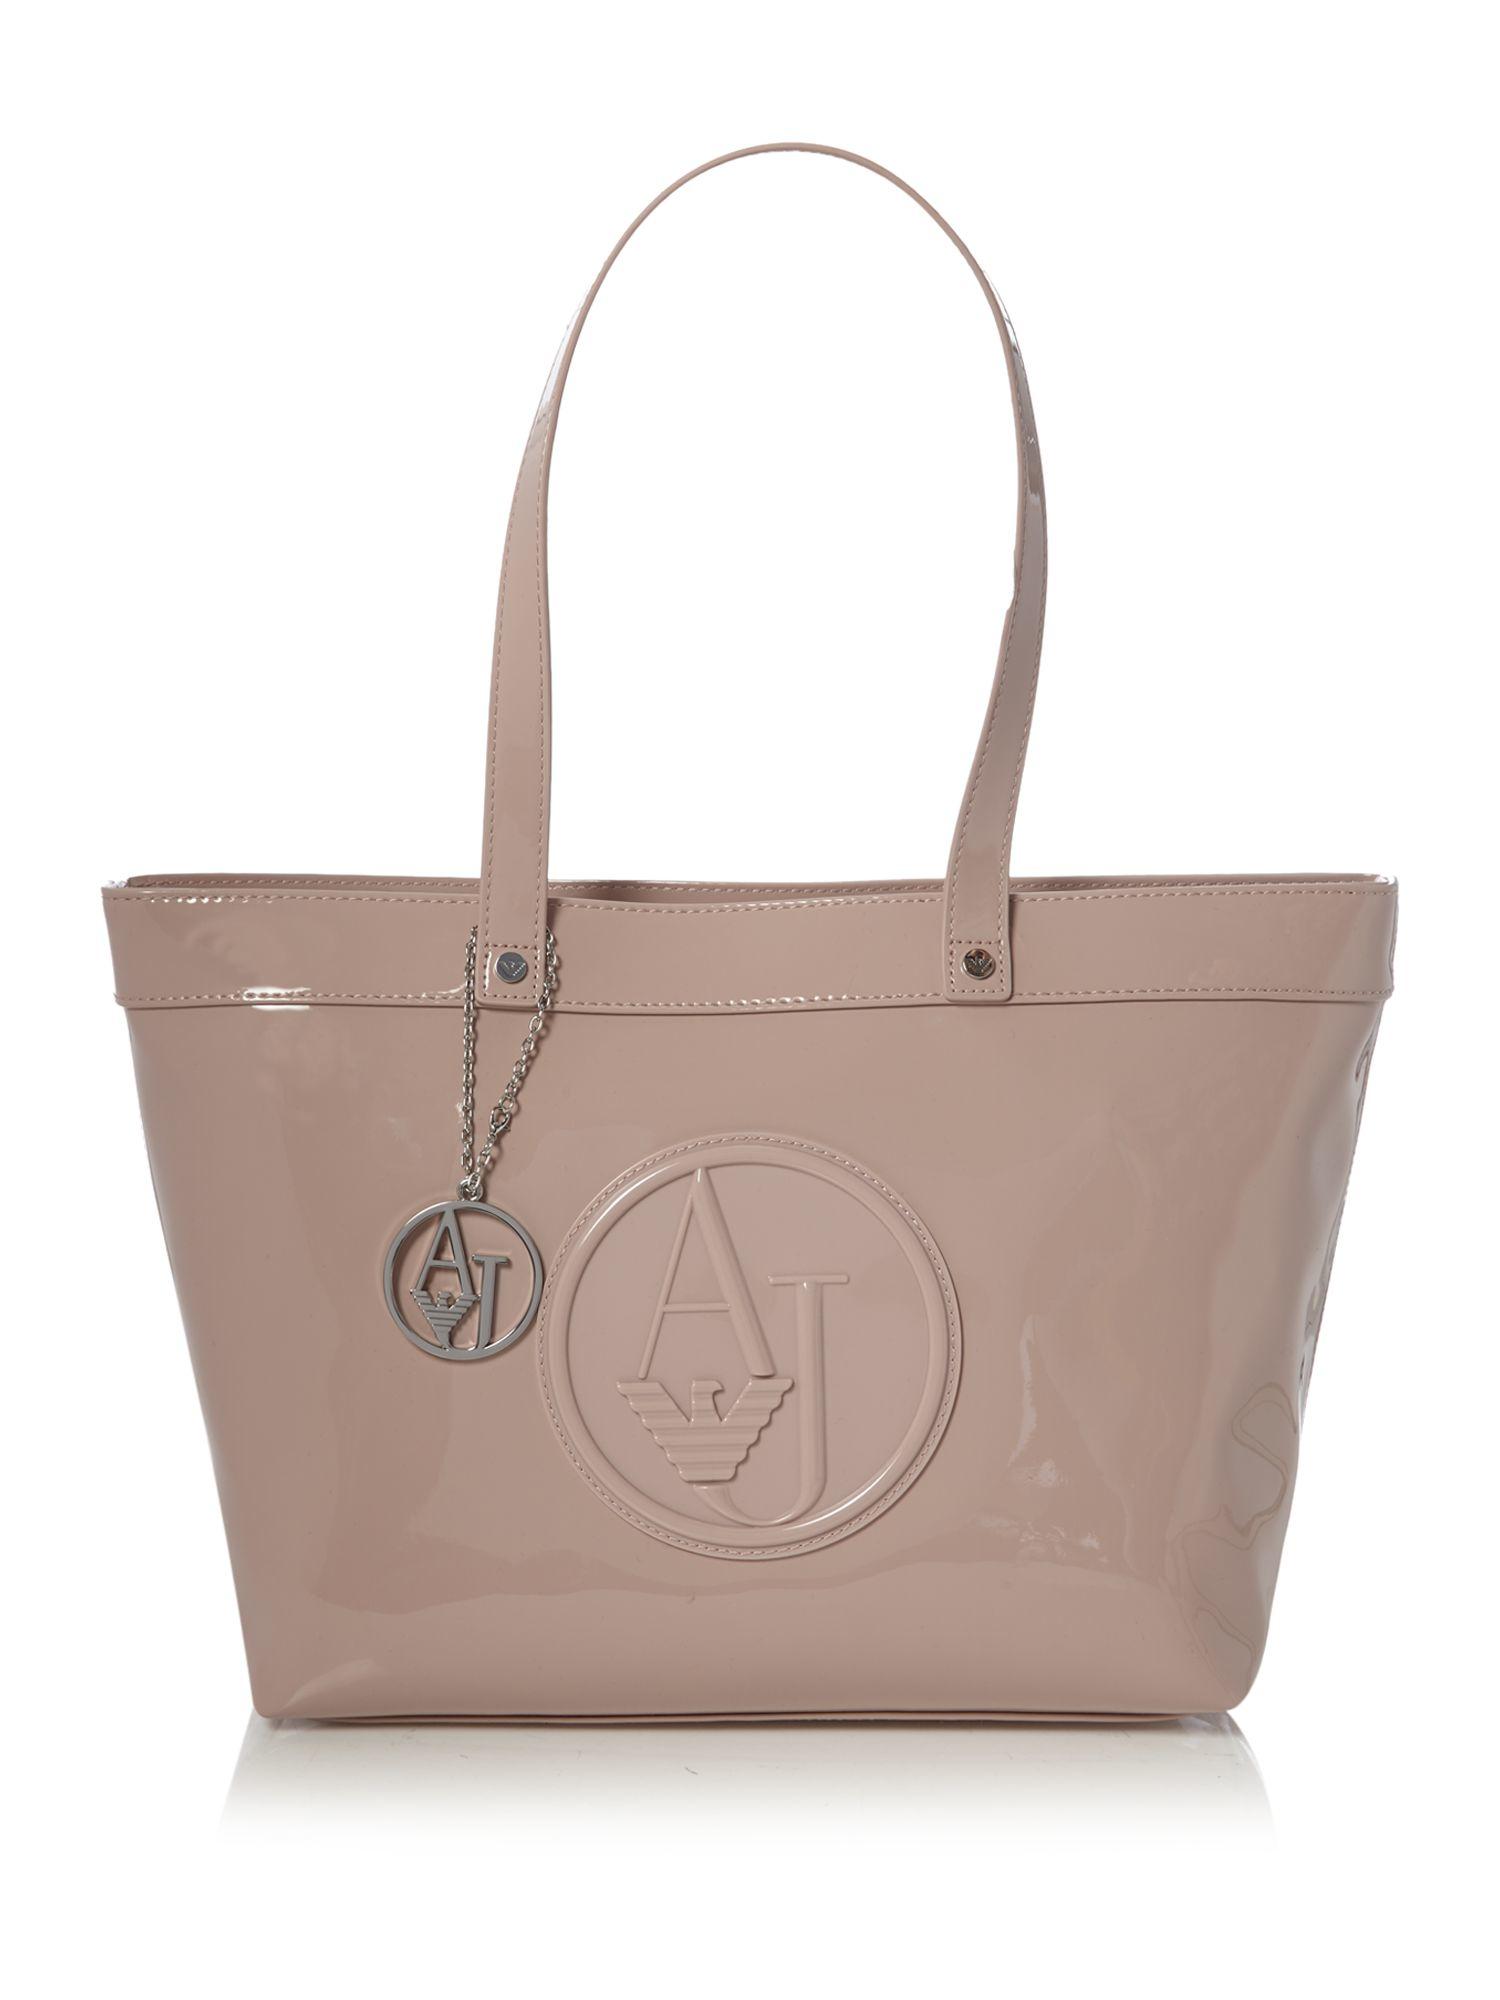 Armani Jeans Patent Light Pink Large Tote Bag in Pink - Lyst 044af9fcfc